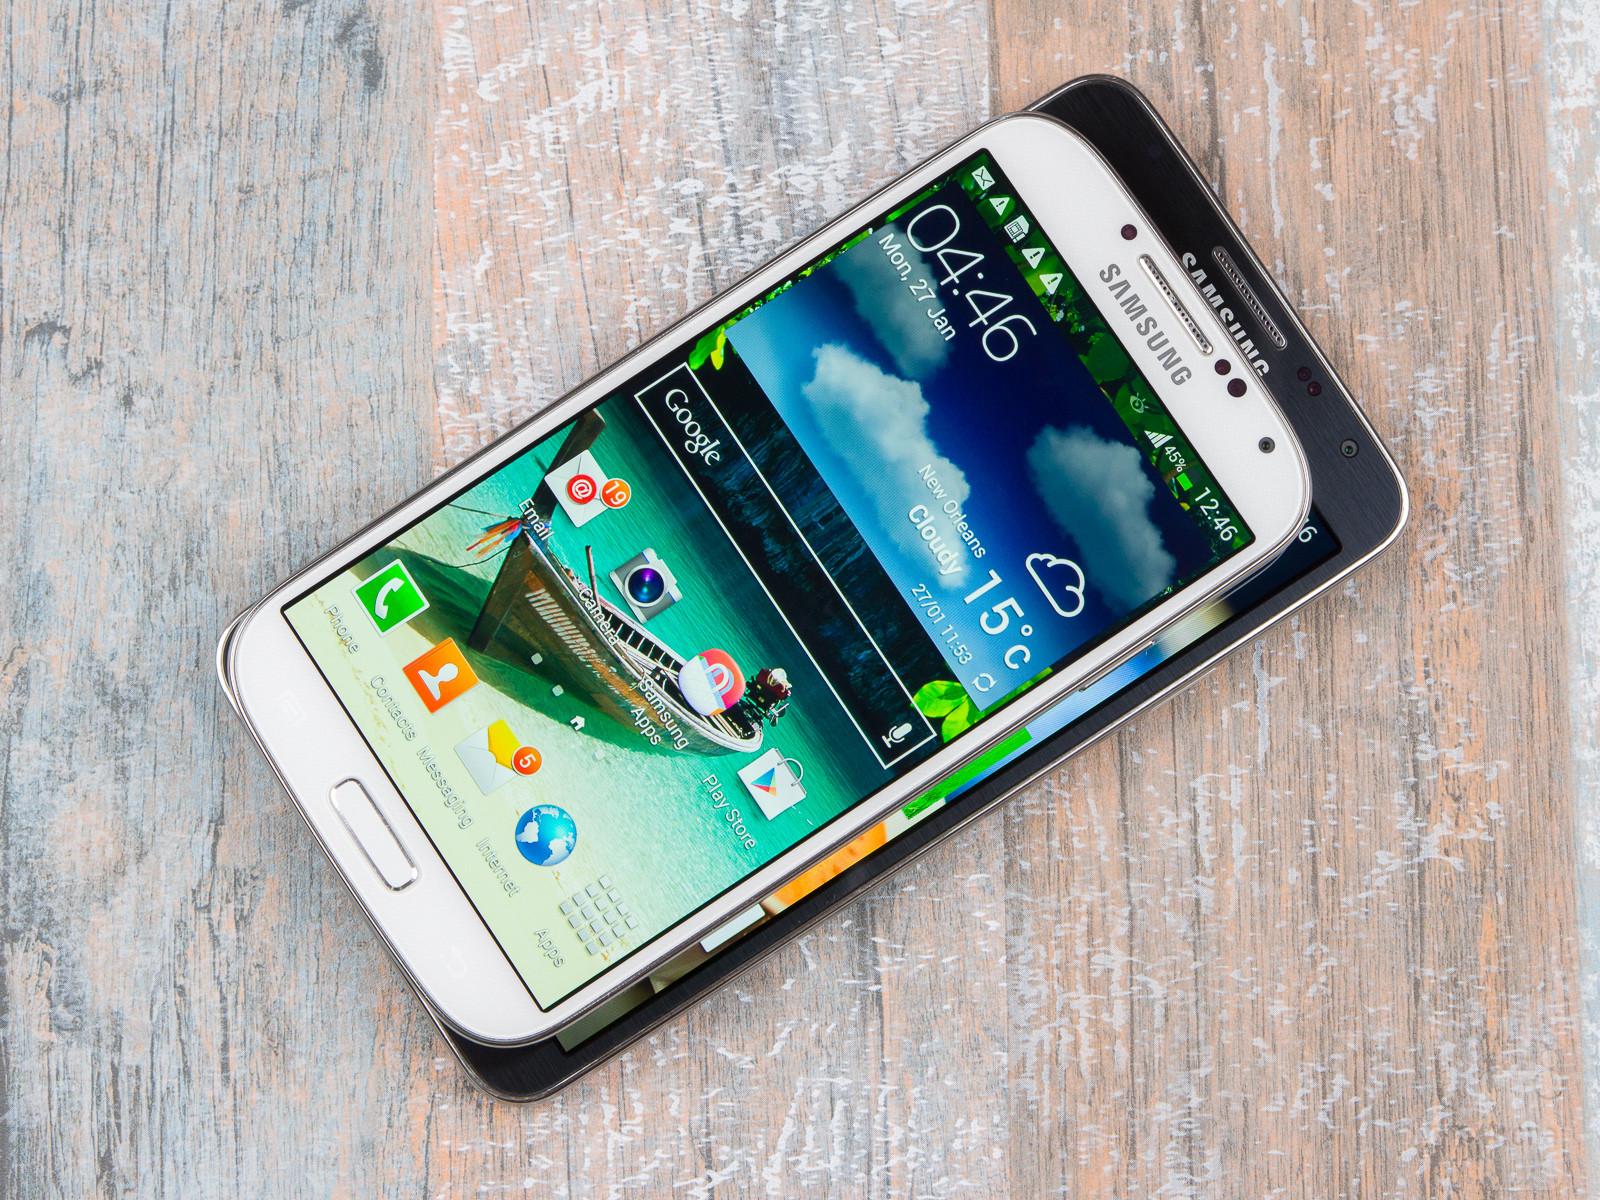 Samsung Galaxy Note 3 Neo Vs Galaxy S4 1600x1200 Download Hd Wallpaper Wallpapertip